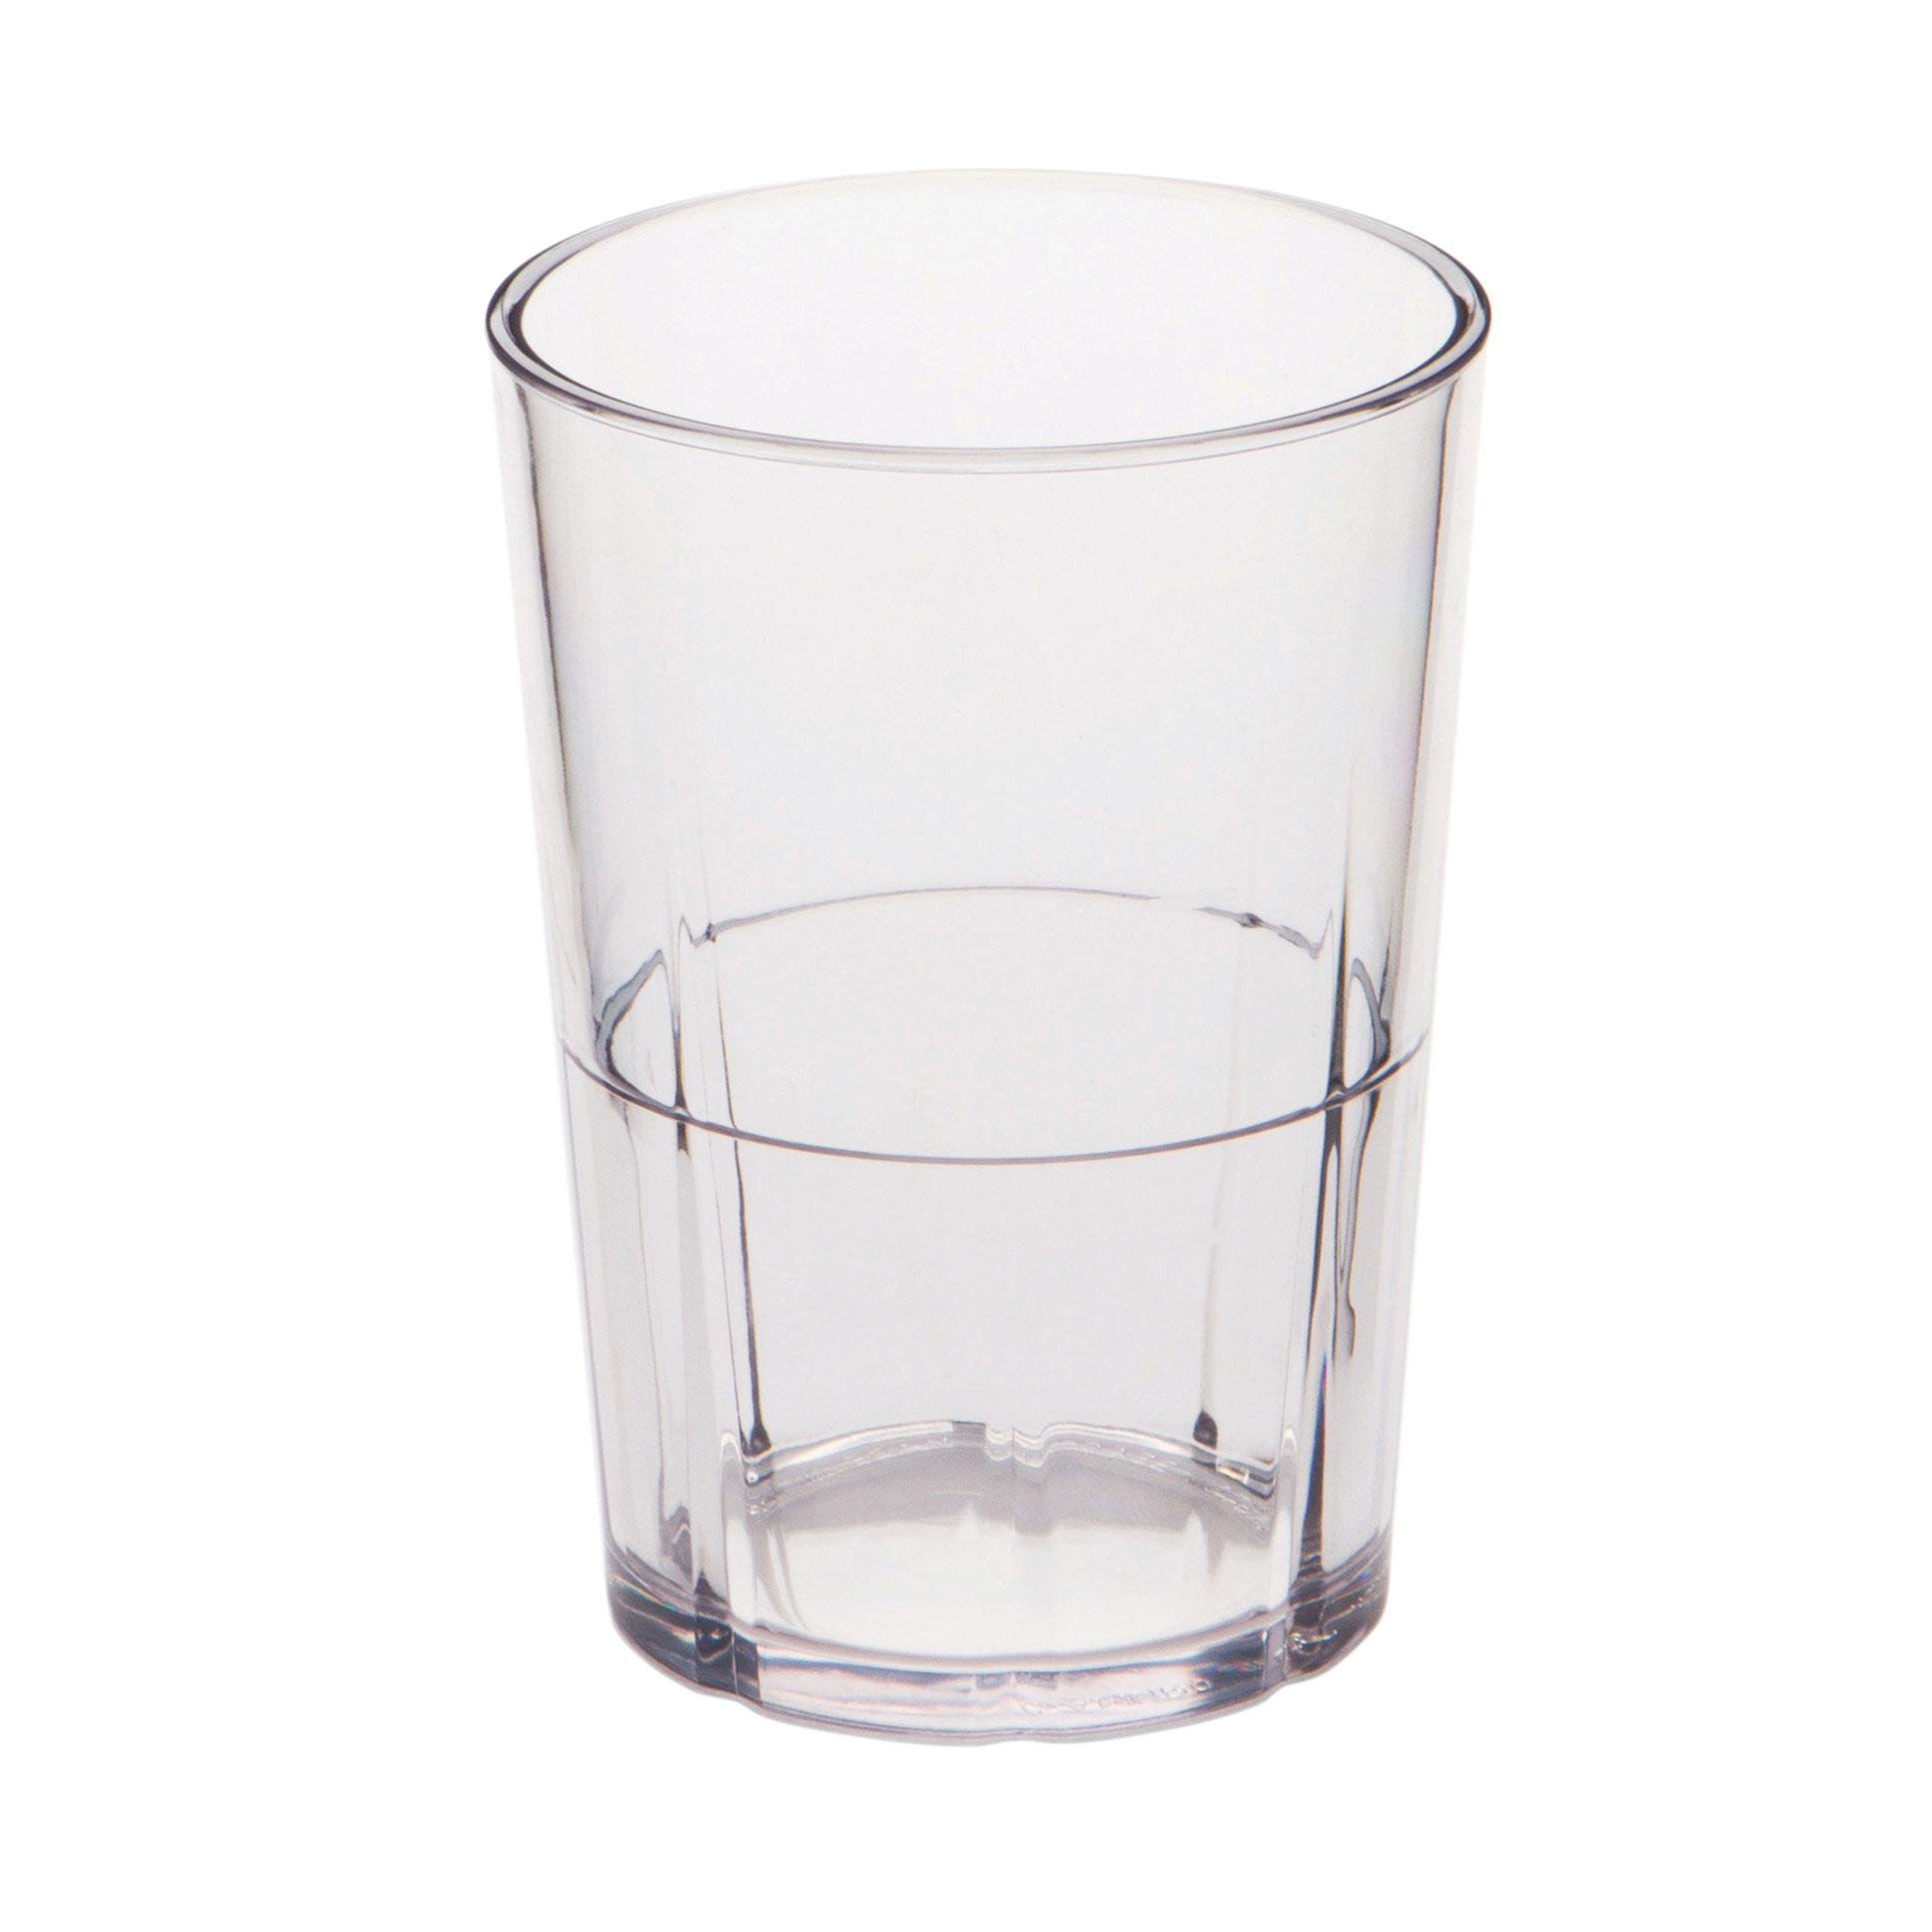 Cambro LDT6152 plastic drinkware